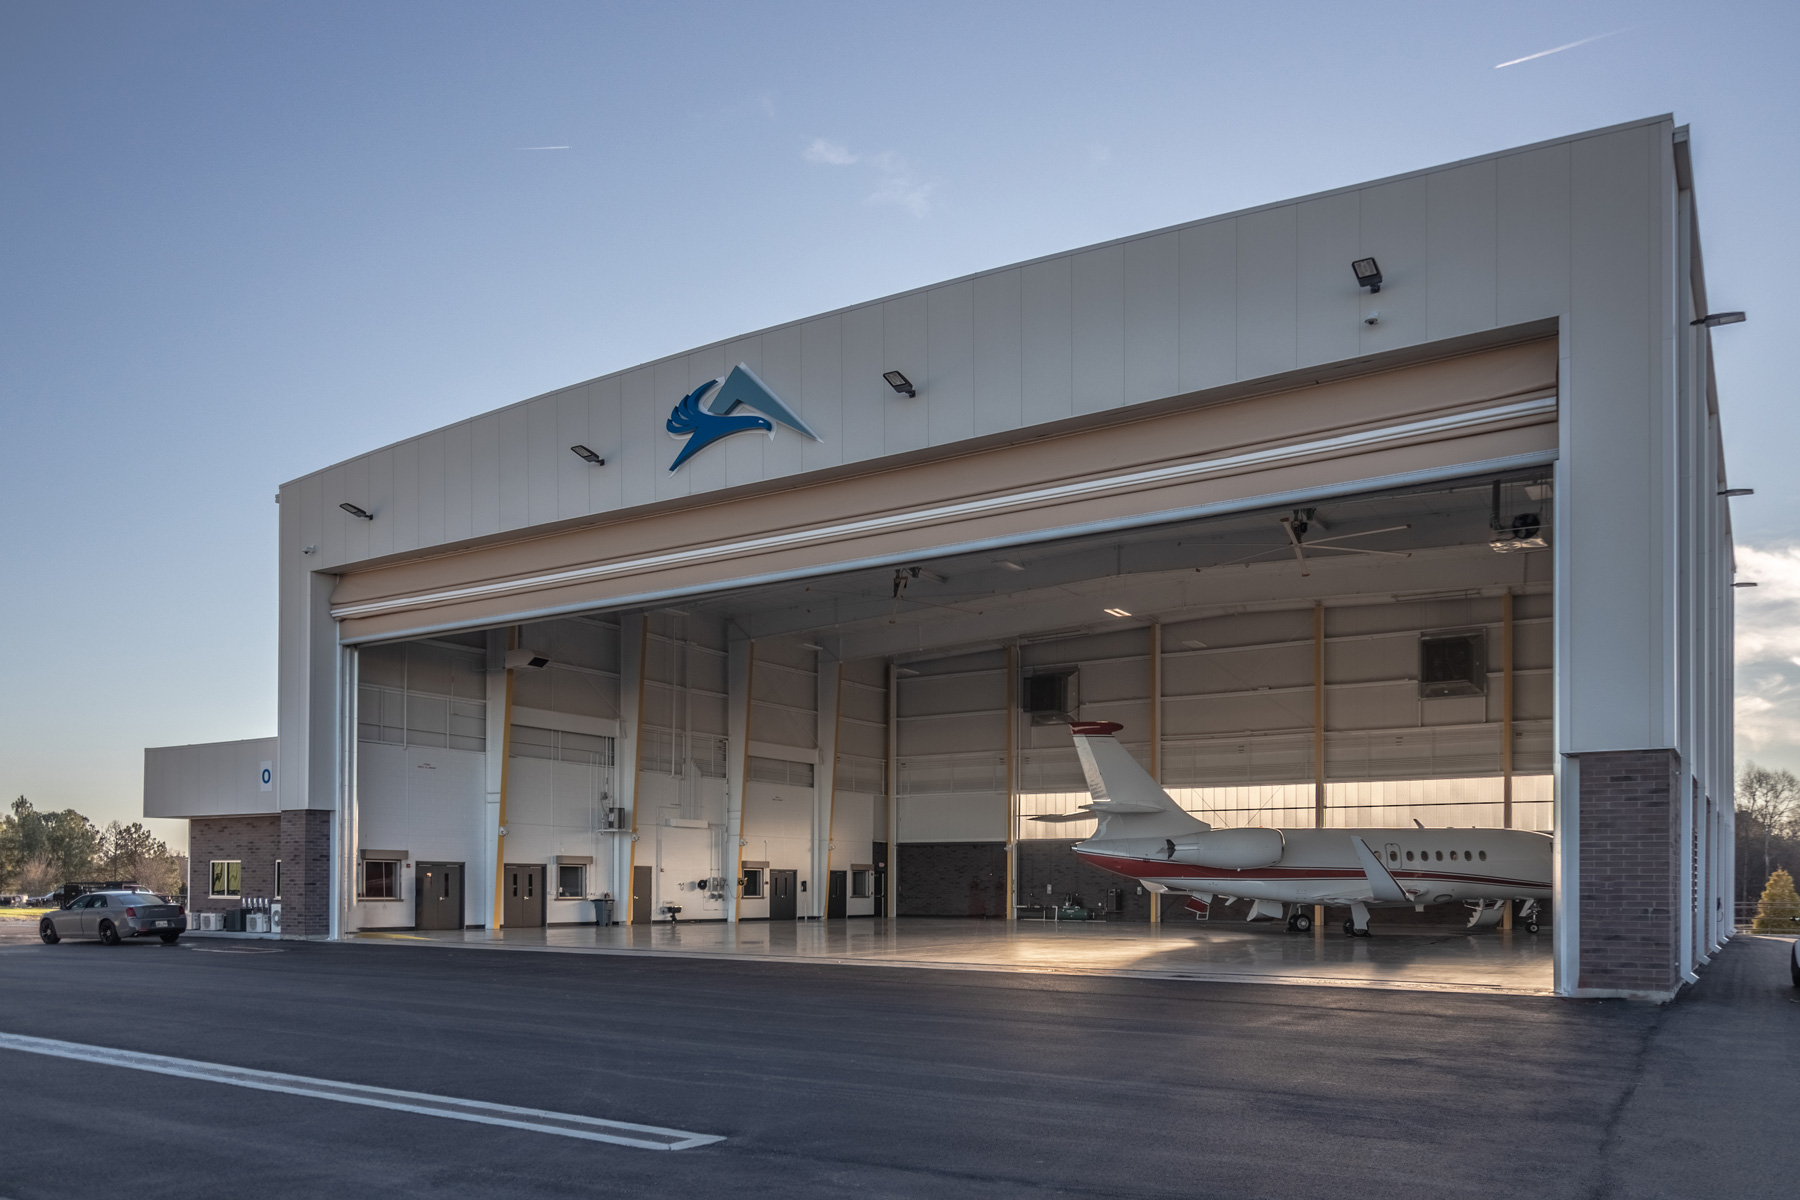 PDK_Hangar-2-Exterior.jpg